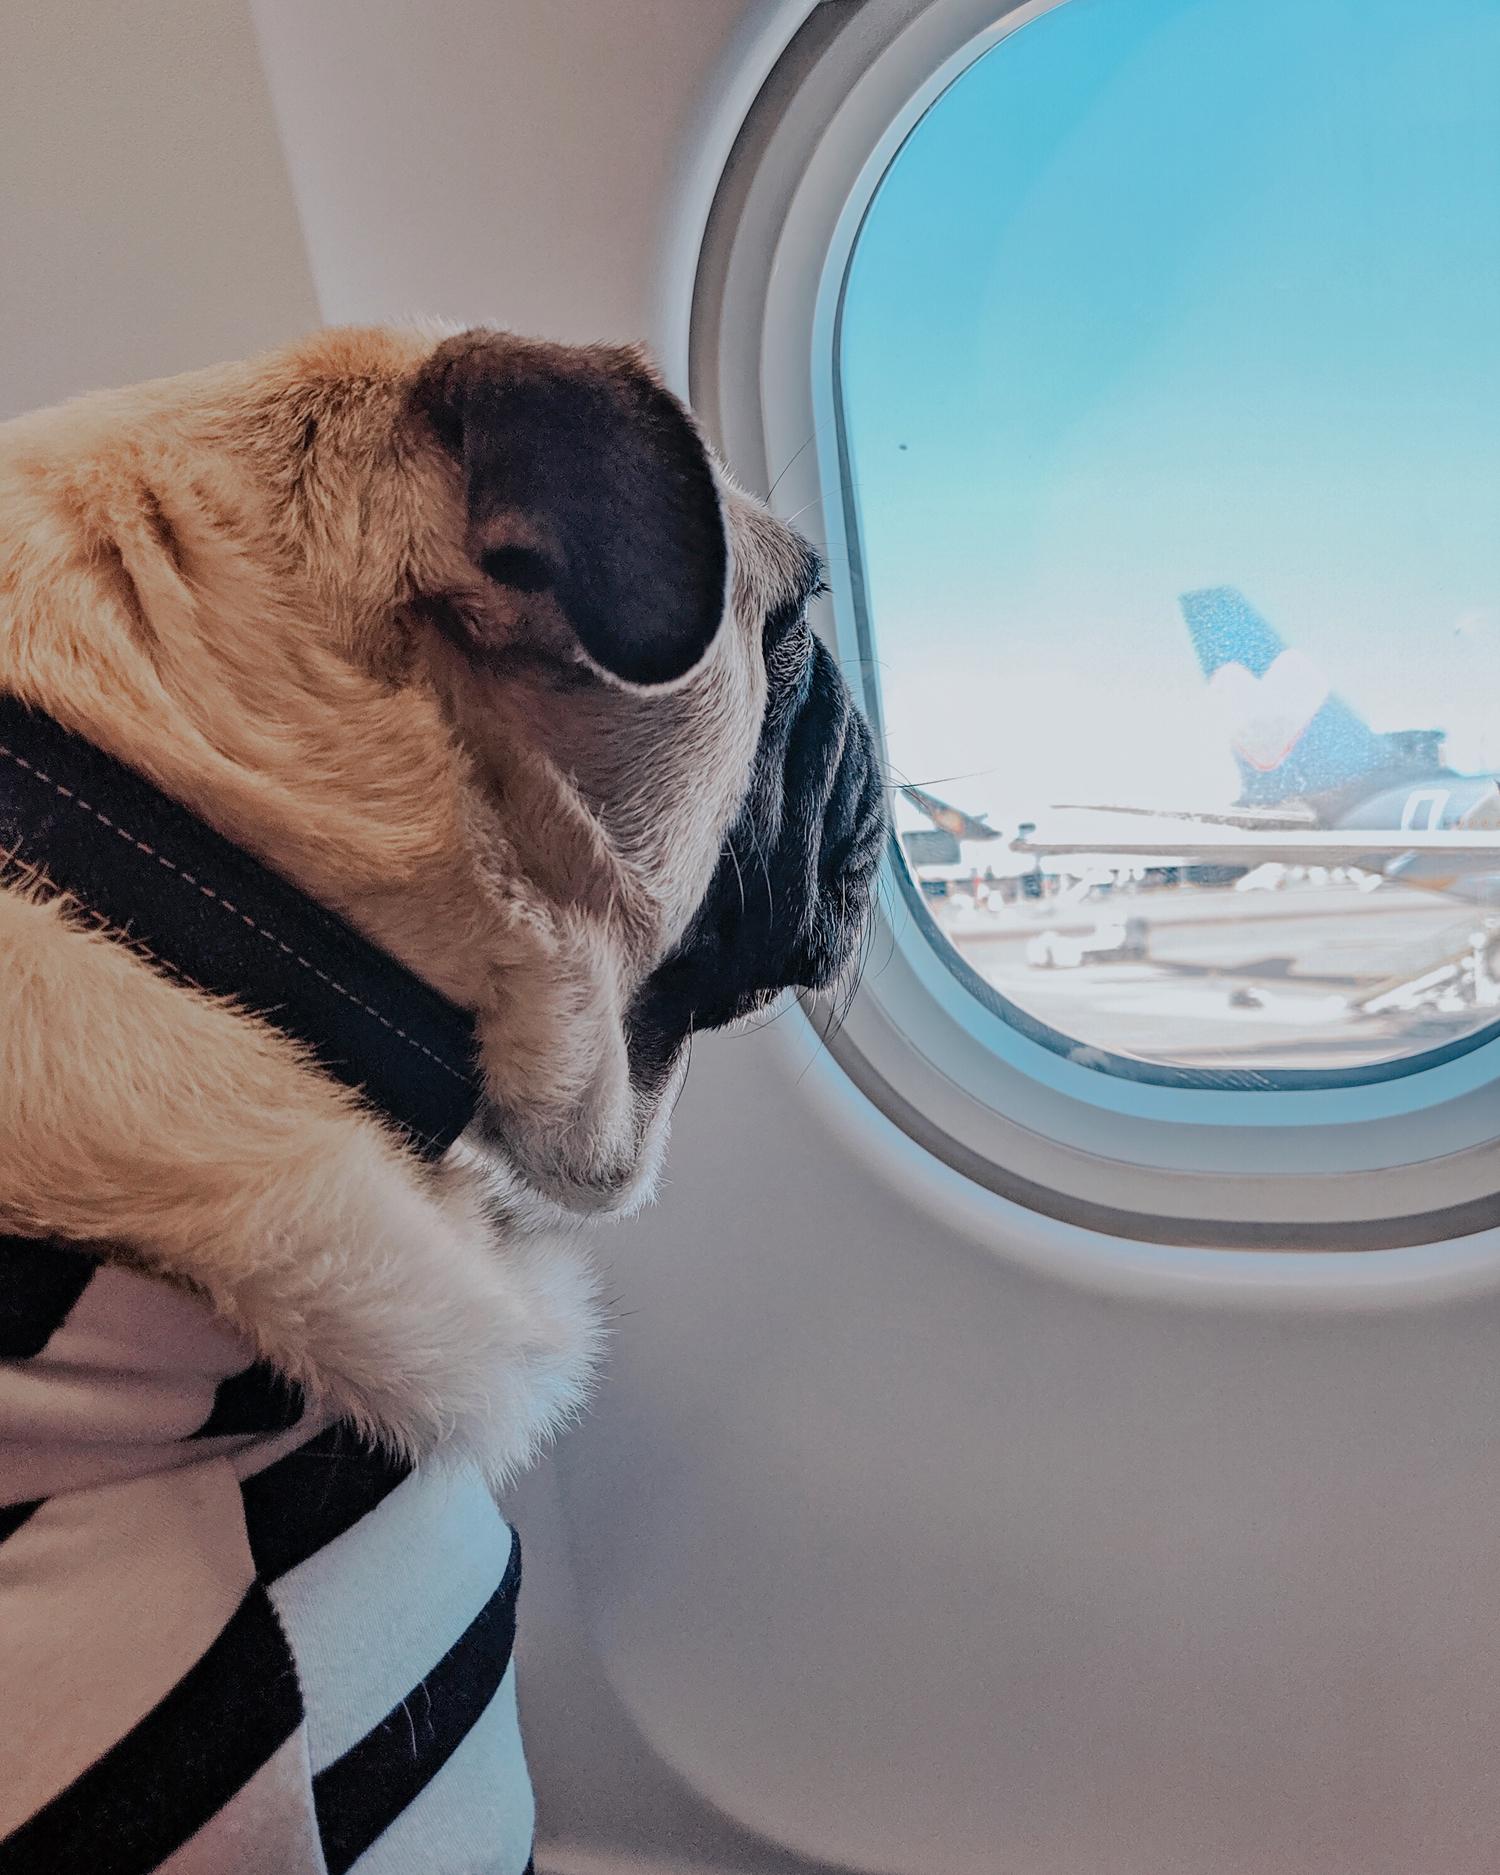 international-travel-with-dog-paris-uk-from-us-dogfriendly-travel.JPG